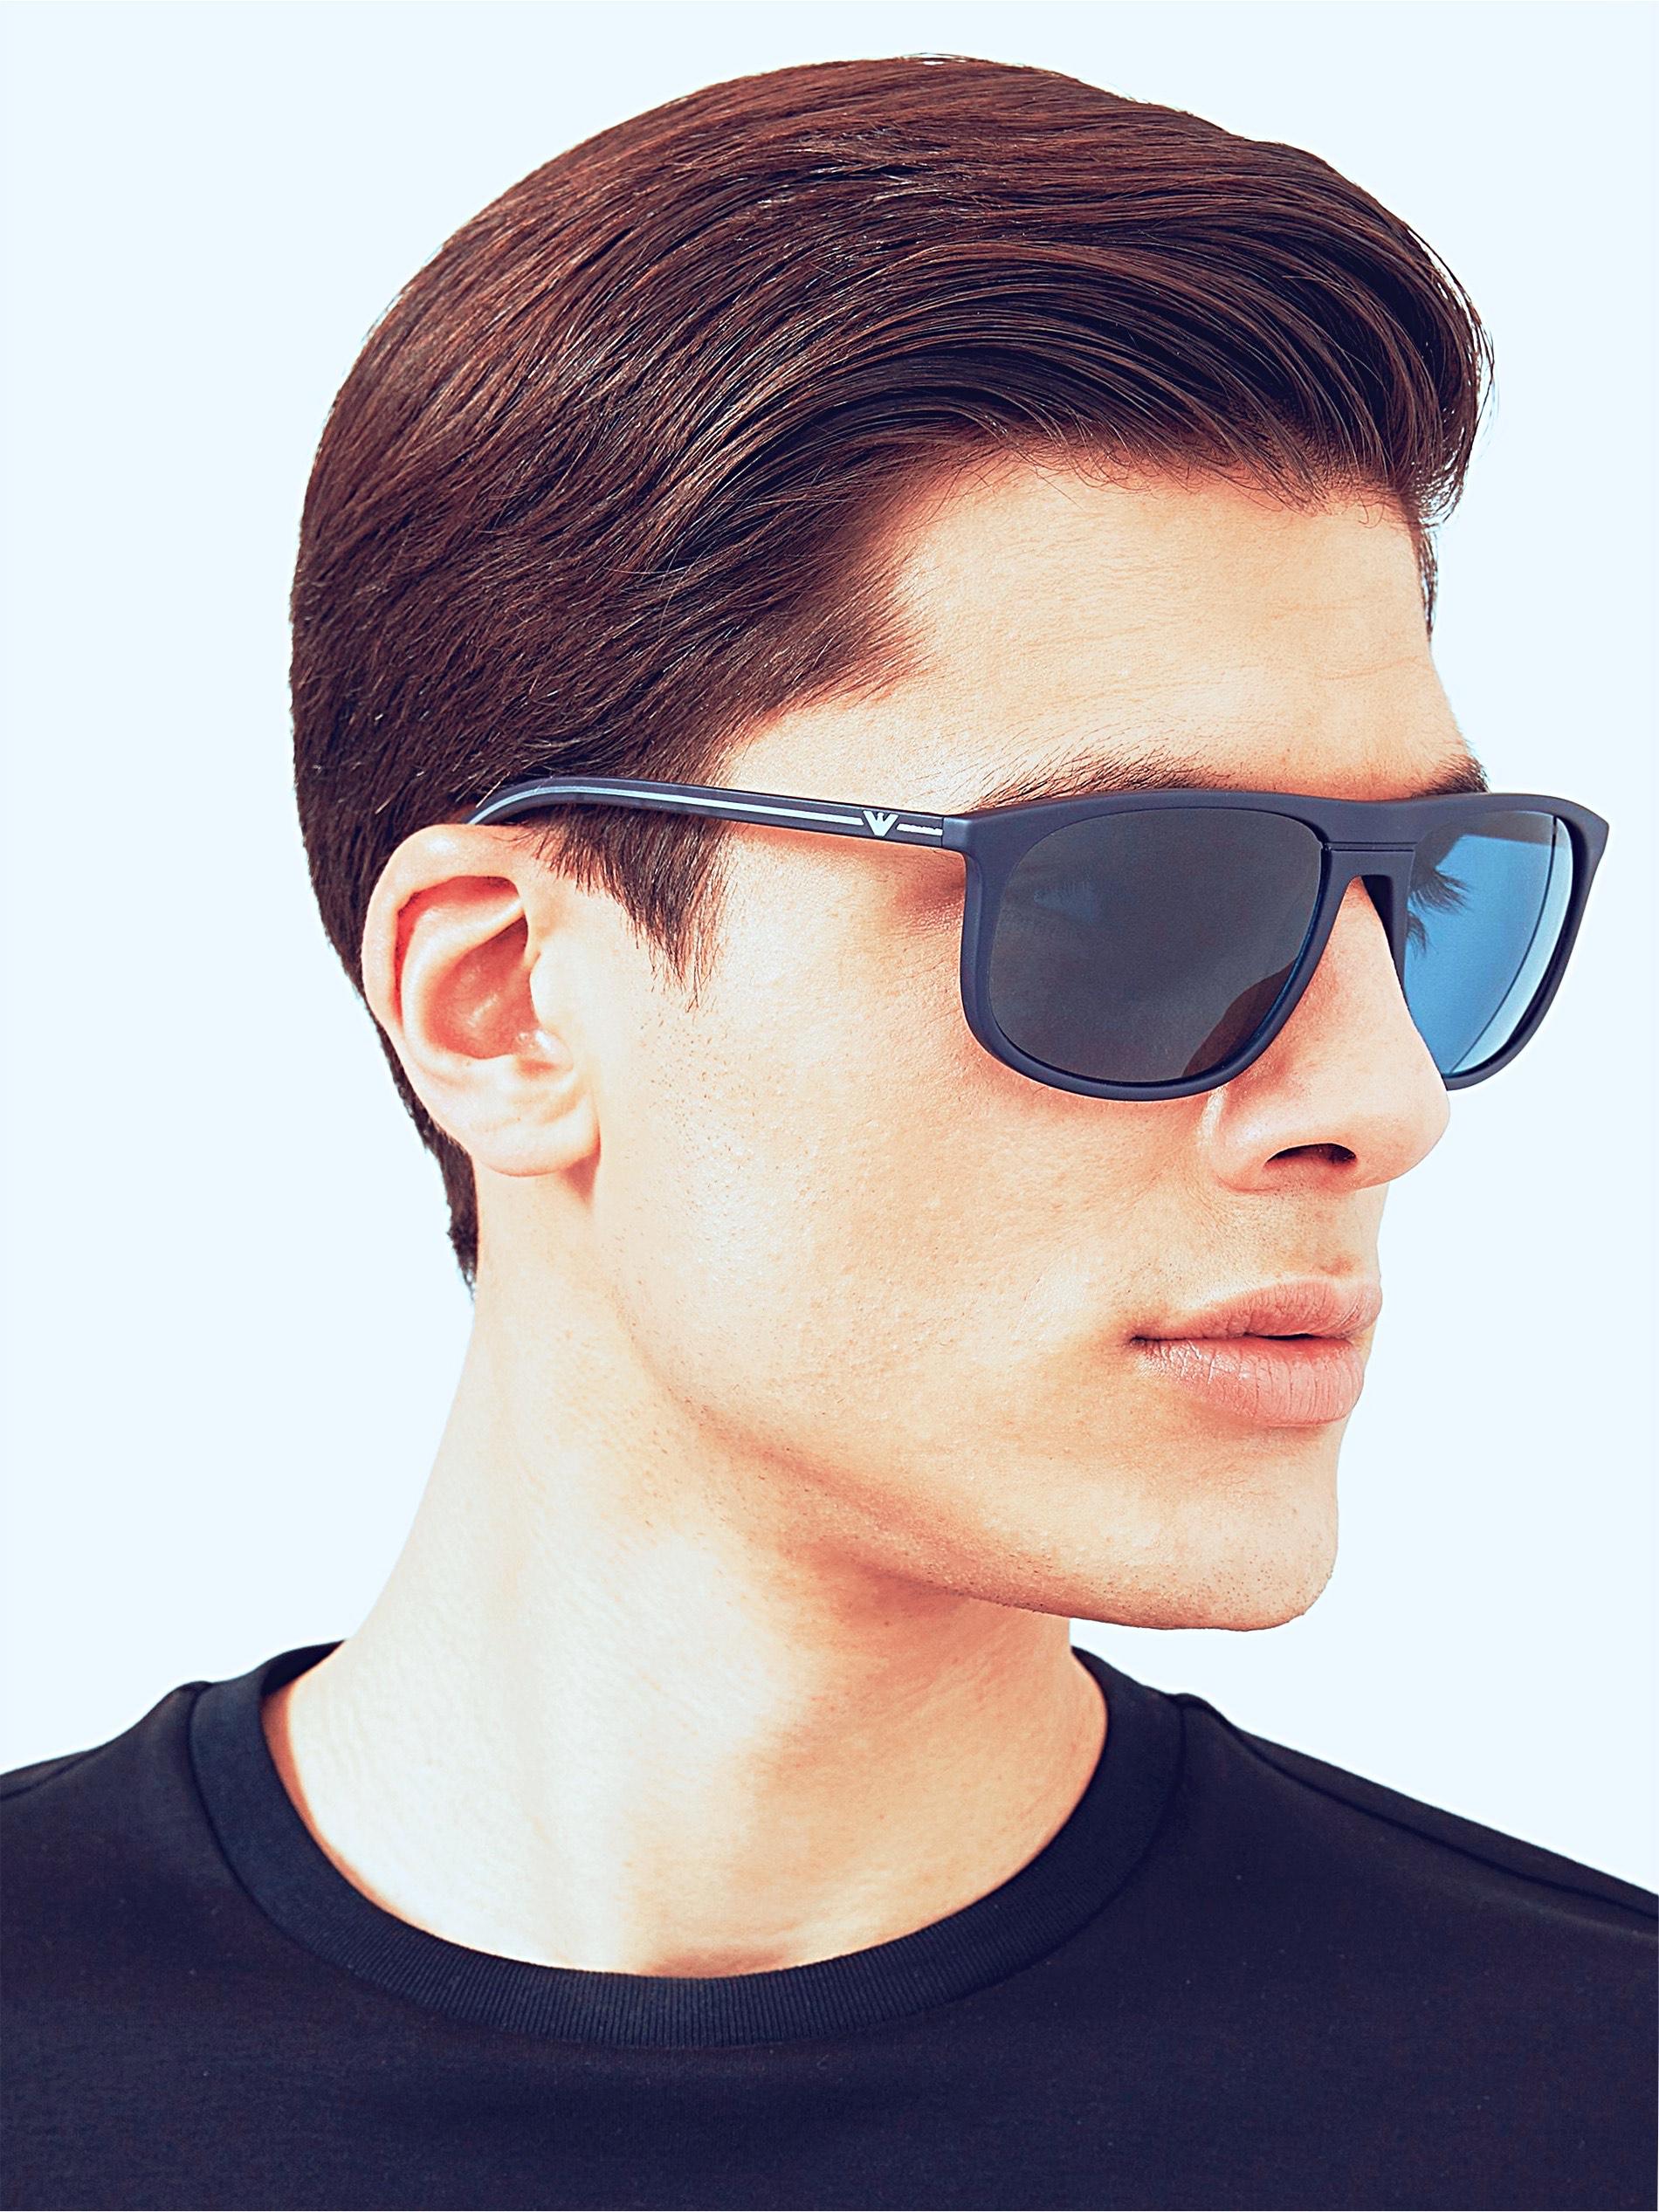 Emporio Armani EA4118 Men's Rectangular Sunglasses, Blue £47.95 at John Lewis & Partners